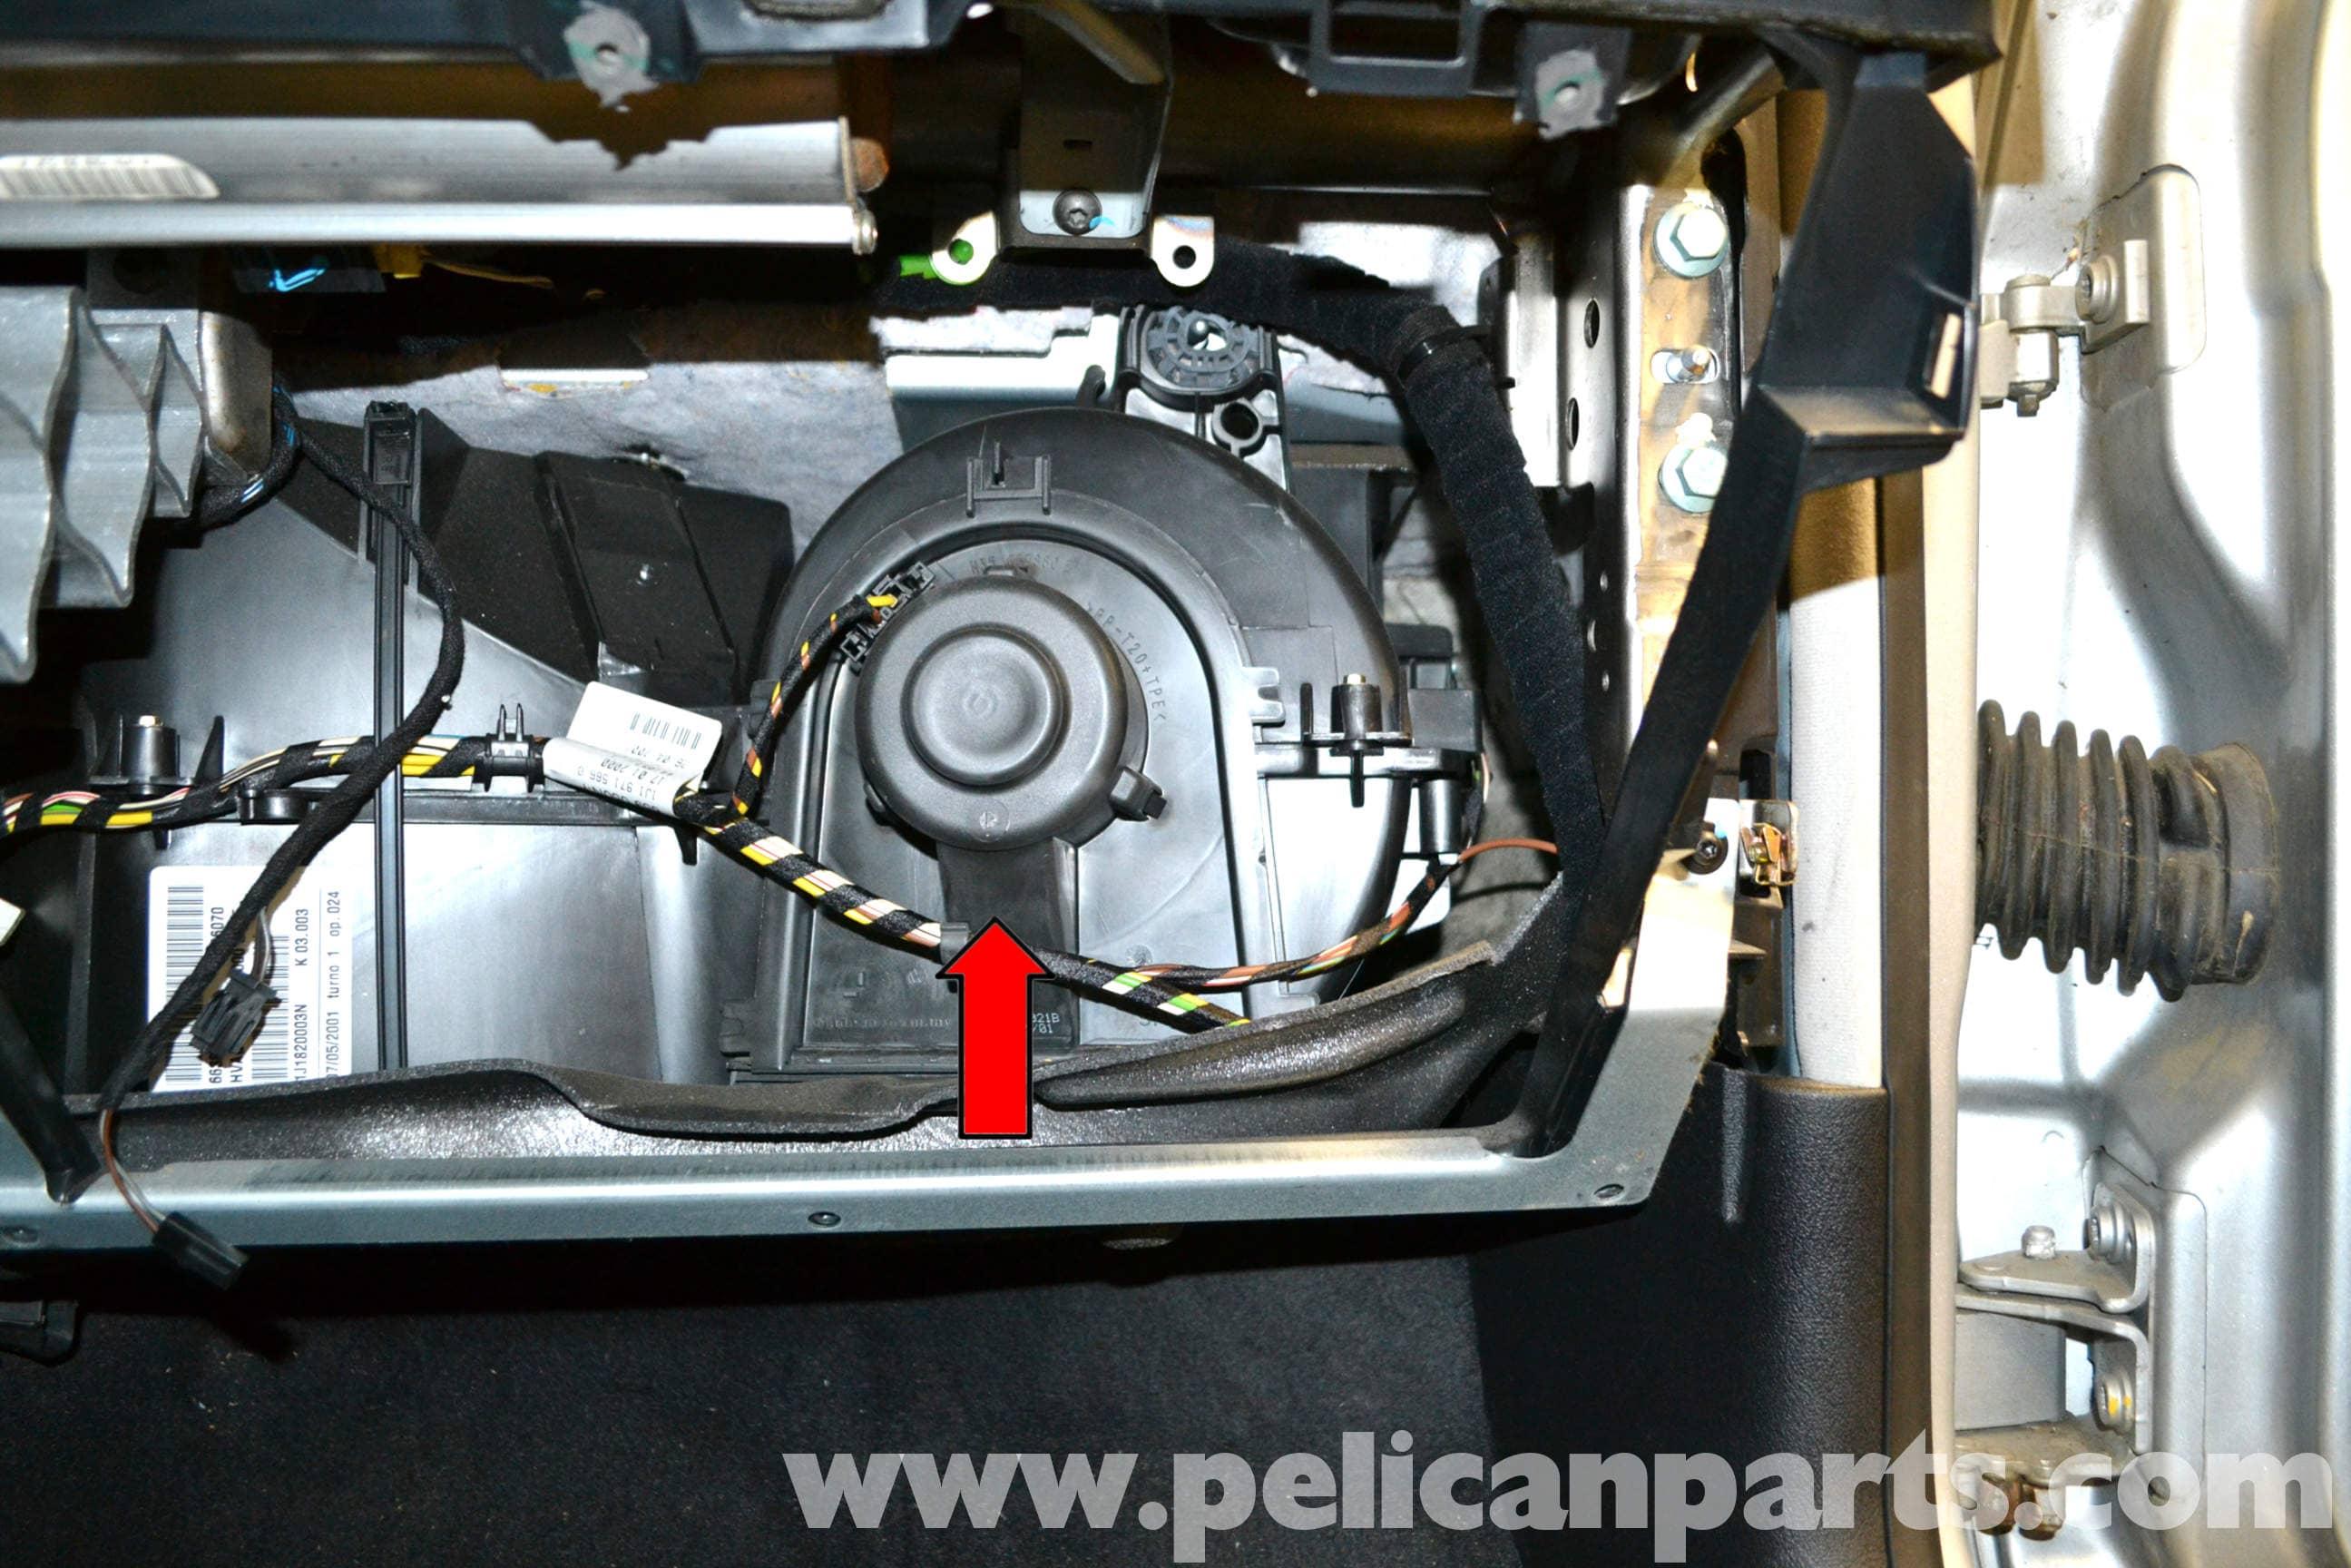 99 beetle 1 8t engine diagram audi 1 8t engine diagram volkswagen golf gti mk iv blower motor and resistor #10